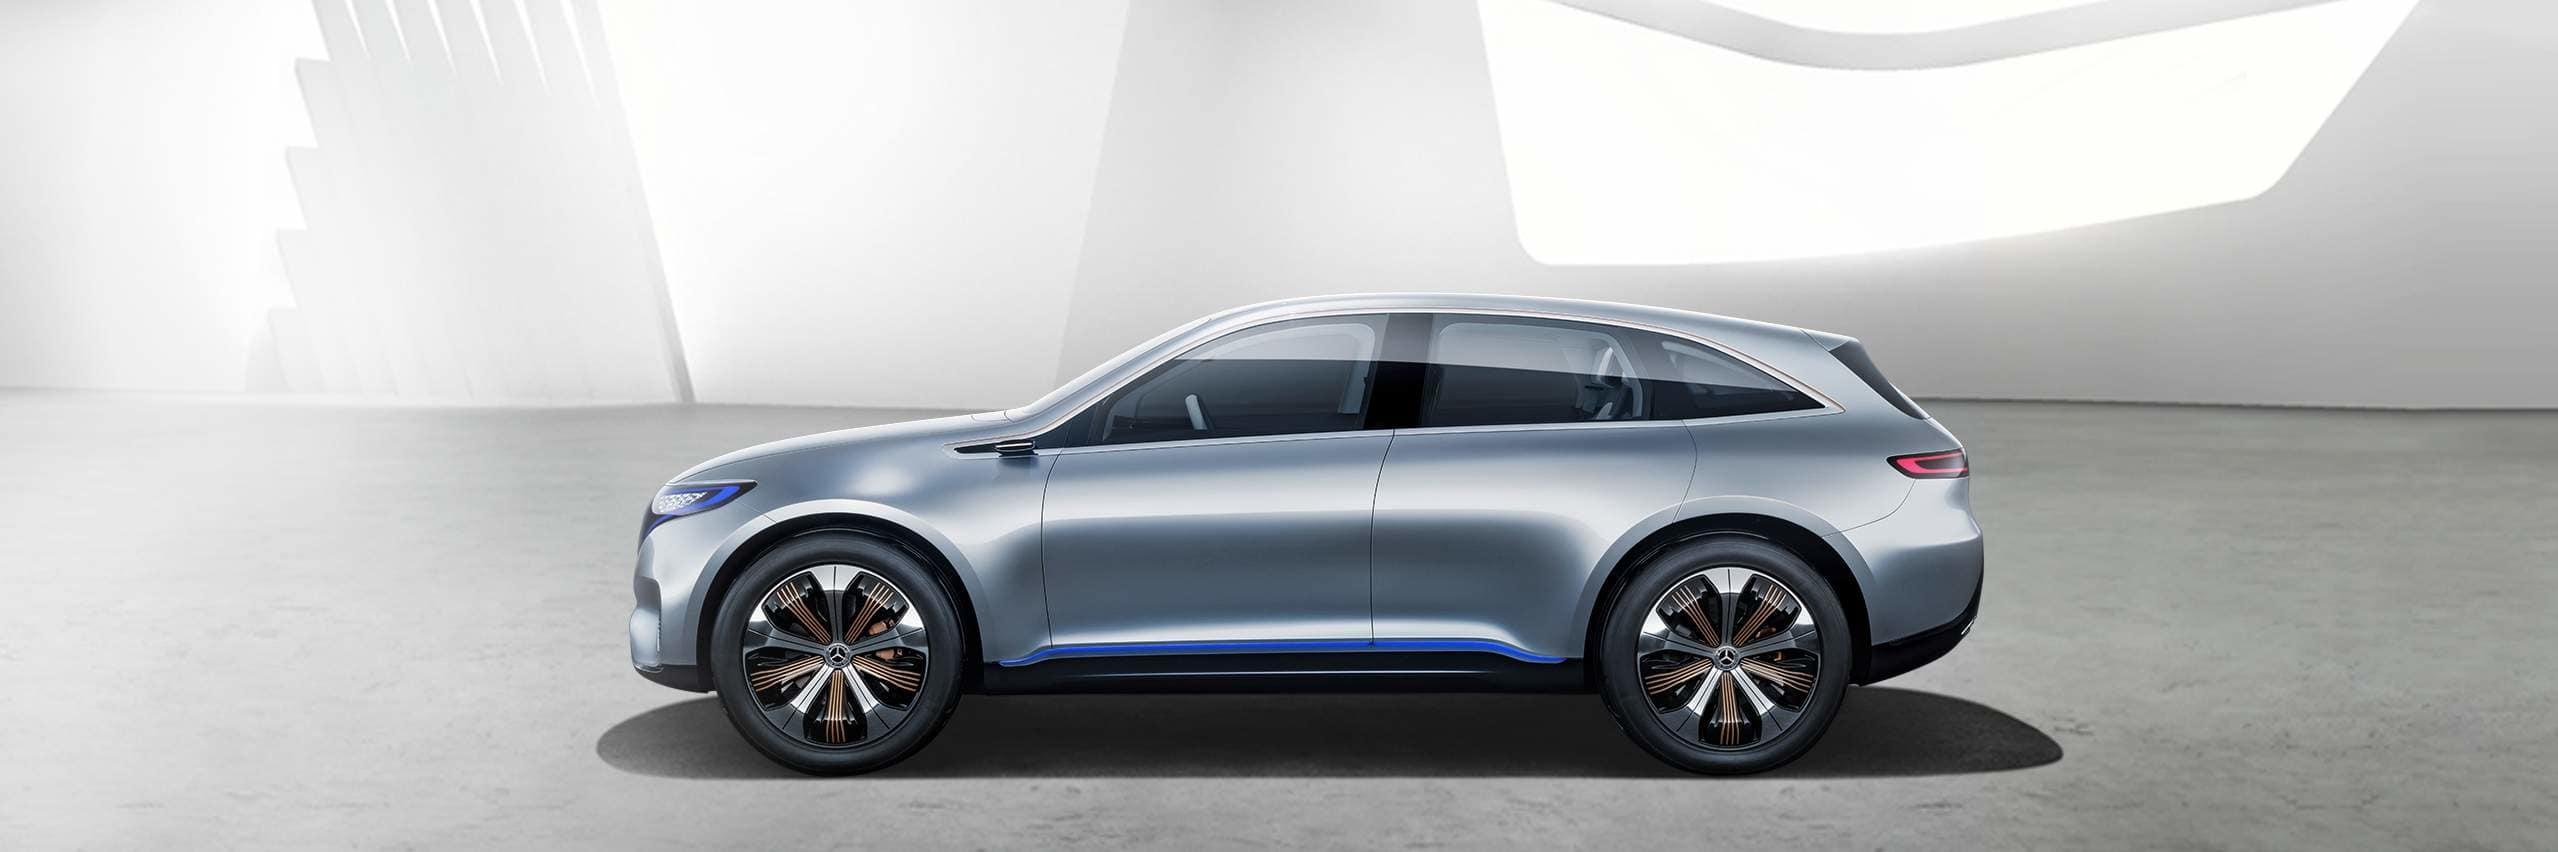 Дизайн Mercedes-Benz